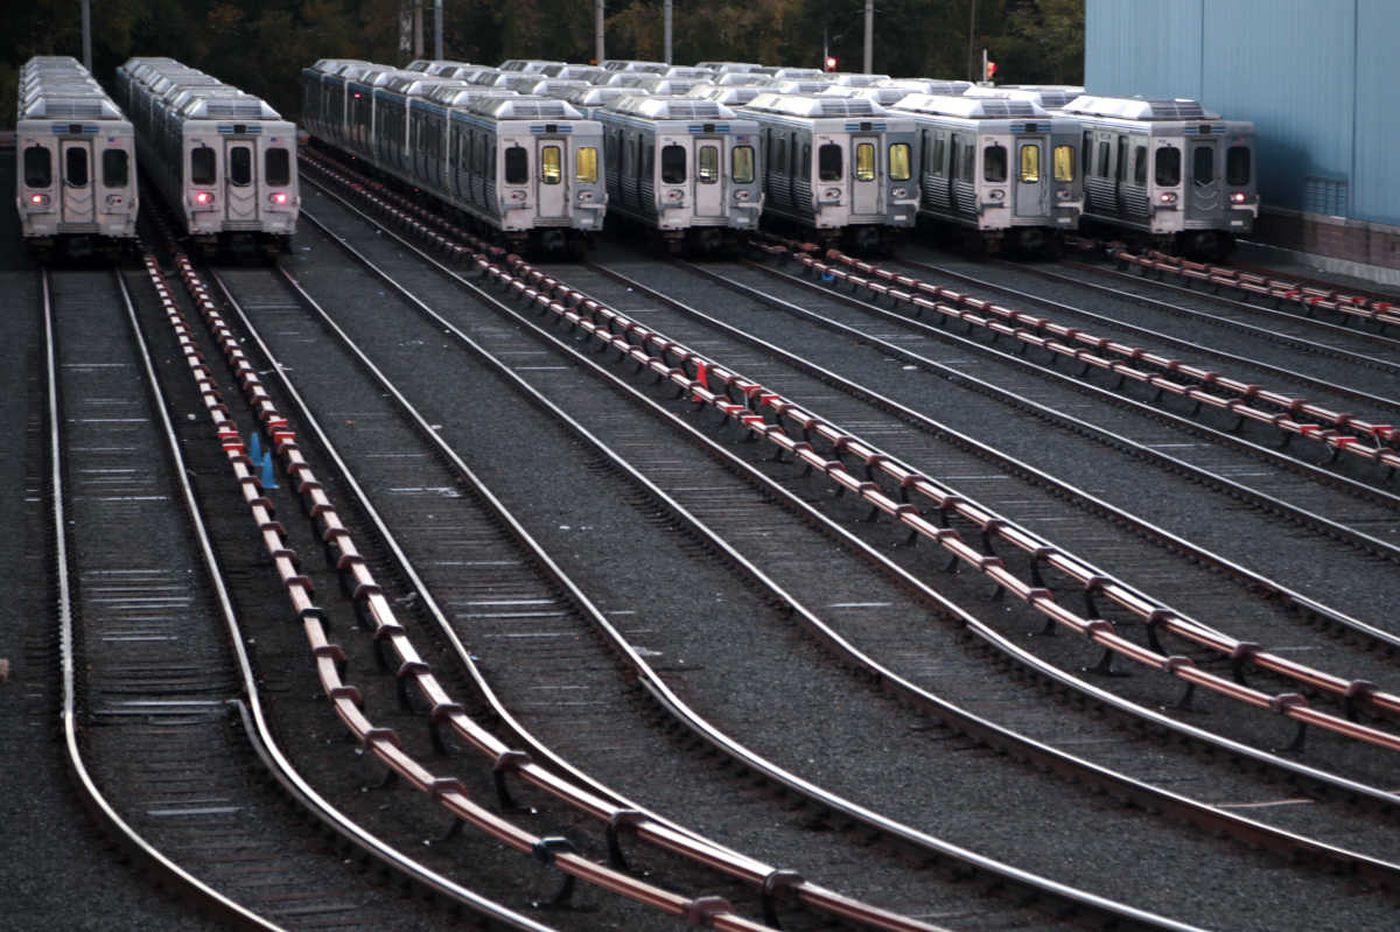 Lawsuit challenging Pennsylvania's transit funding dismissed